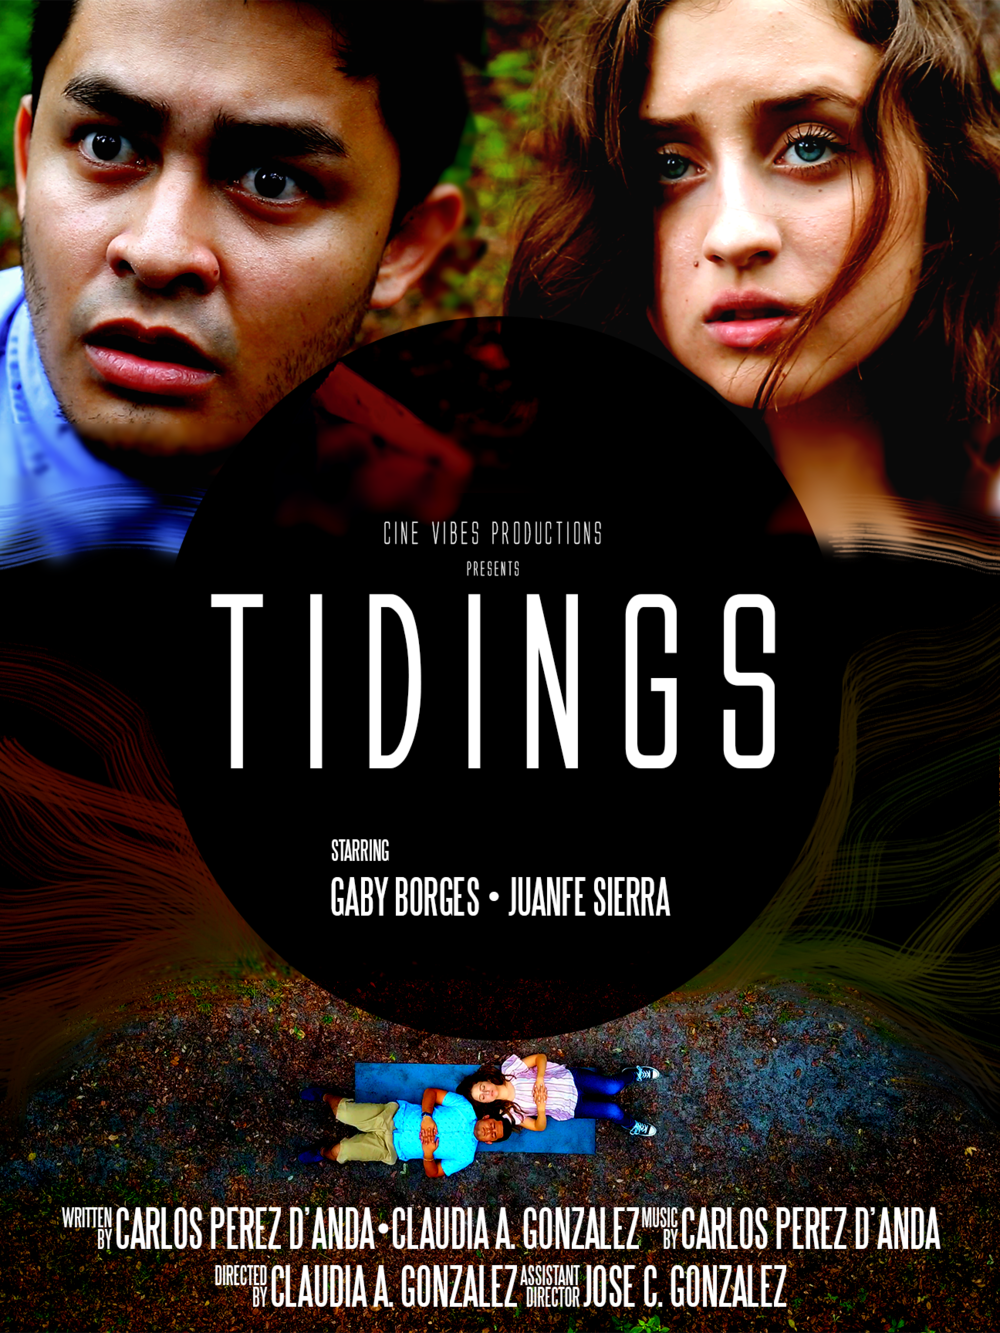 Tidings Poster